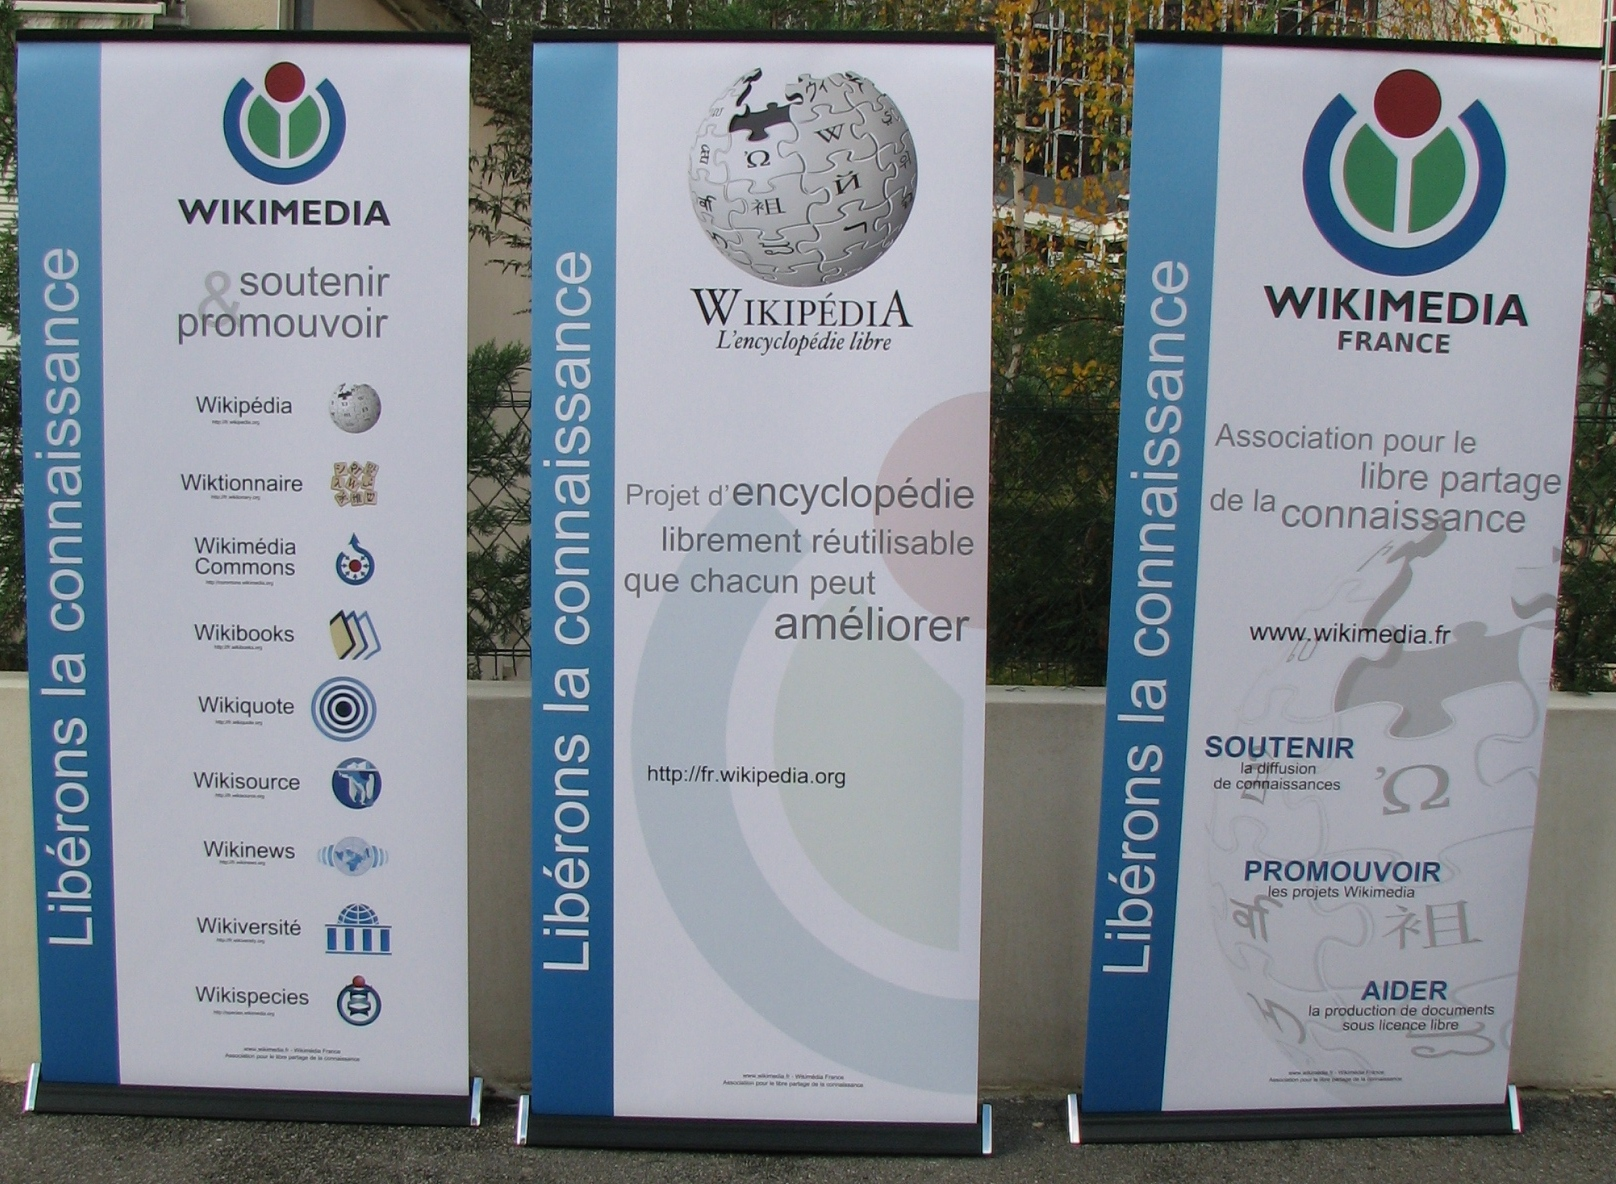 Exemple : Kakémonos Wikimédia